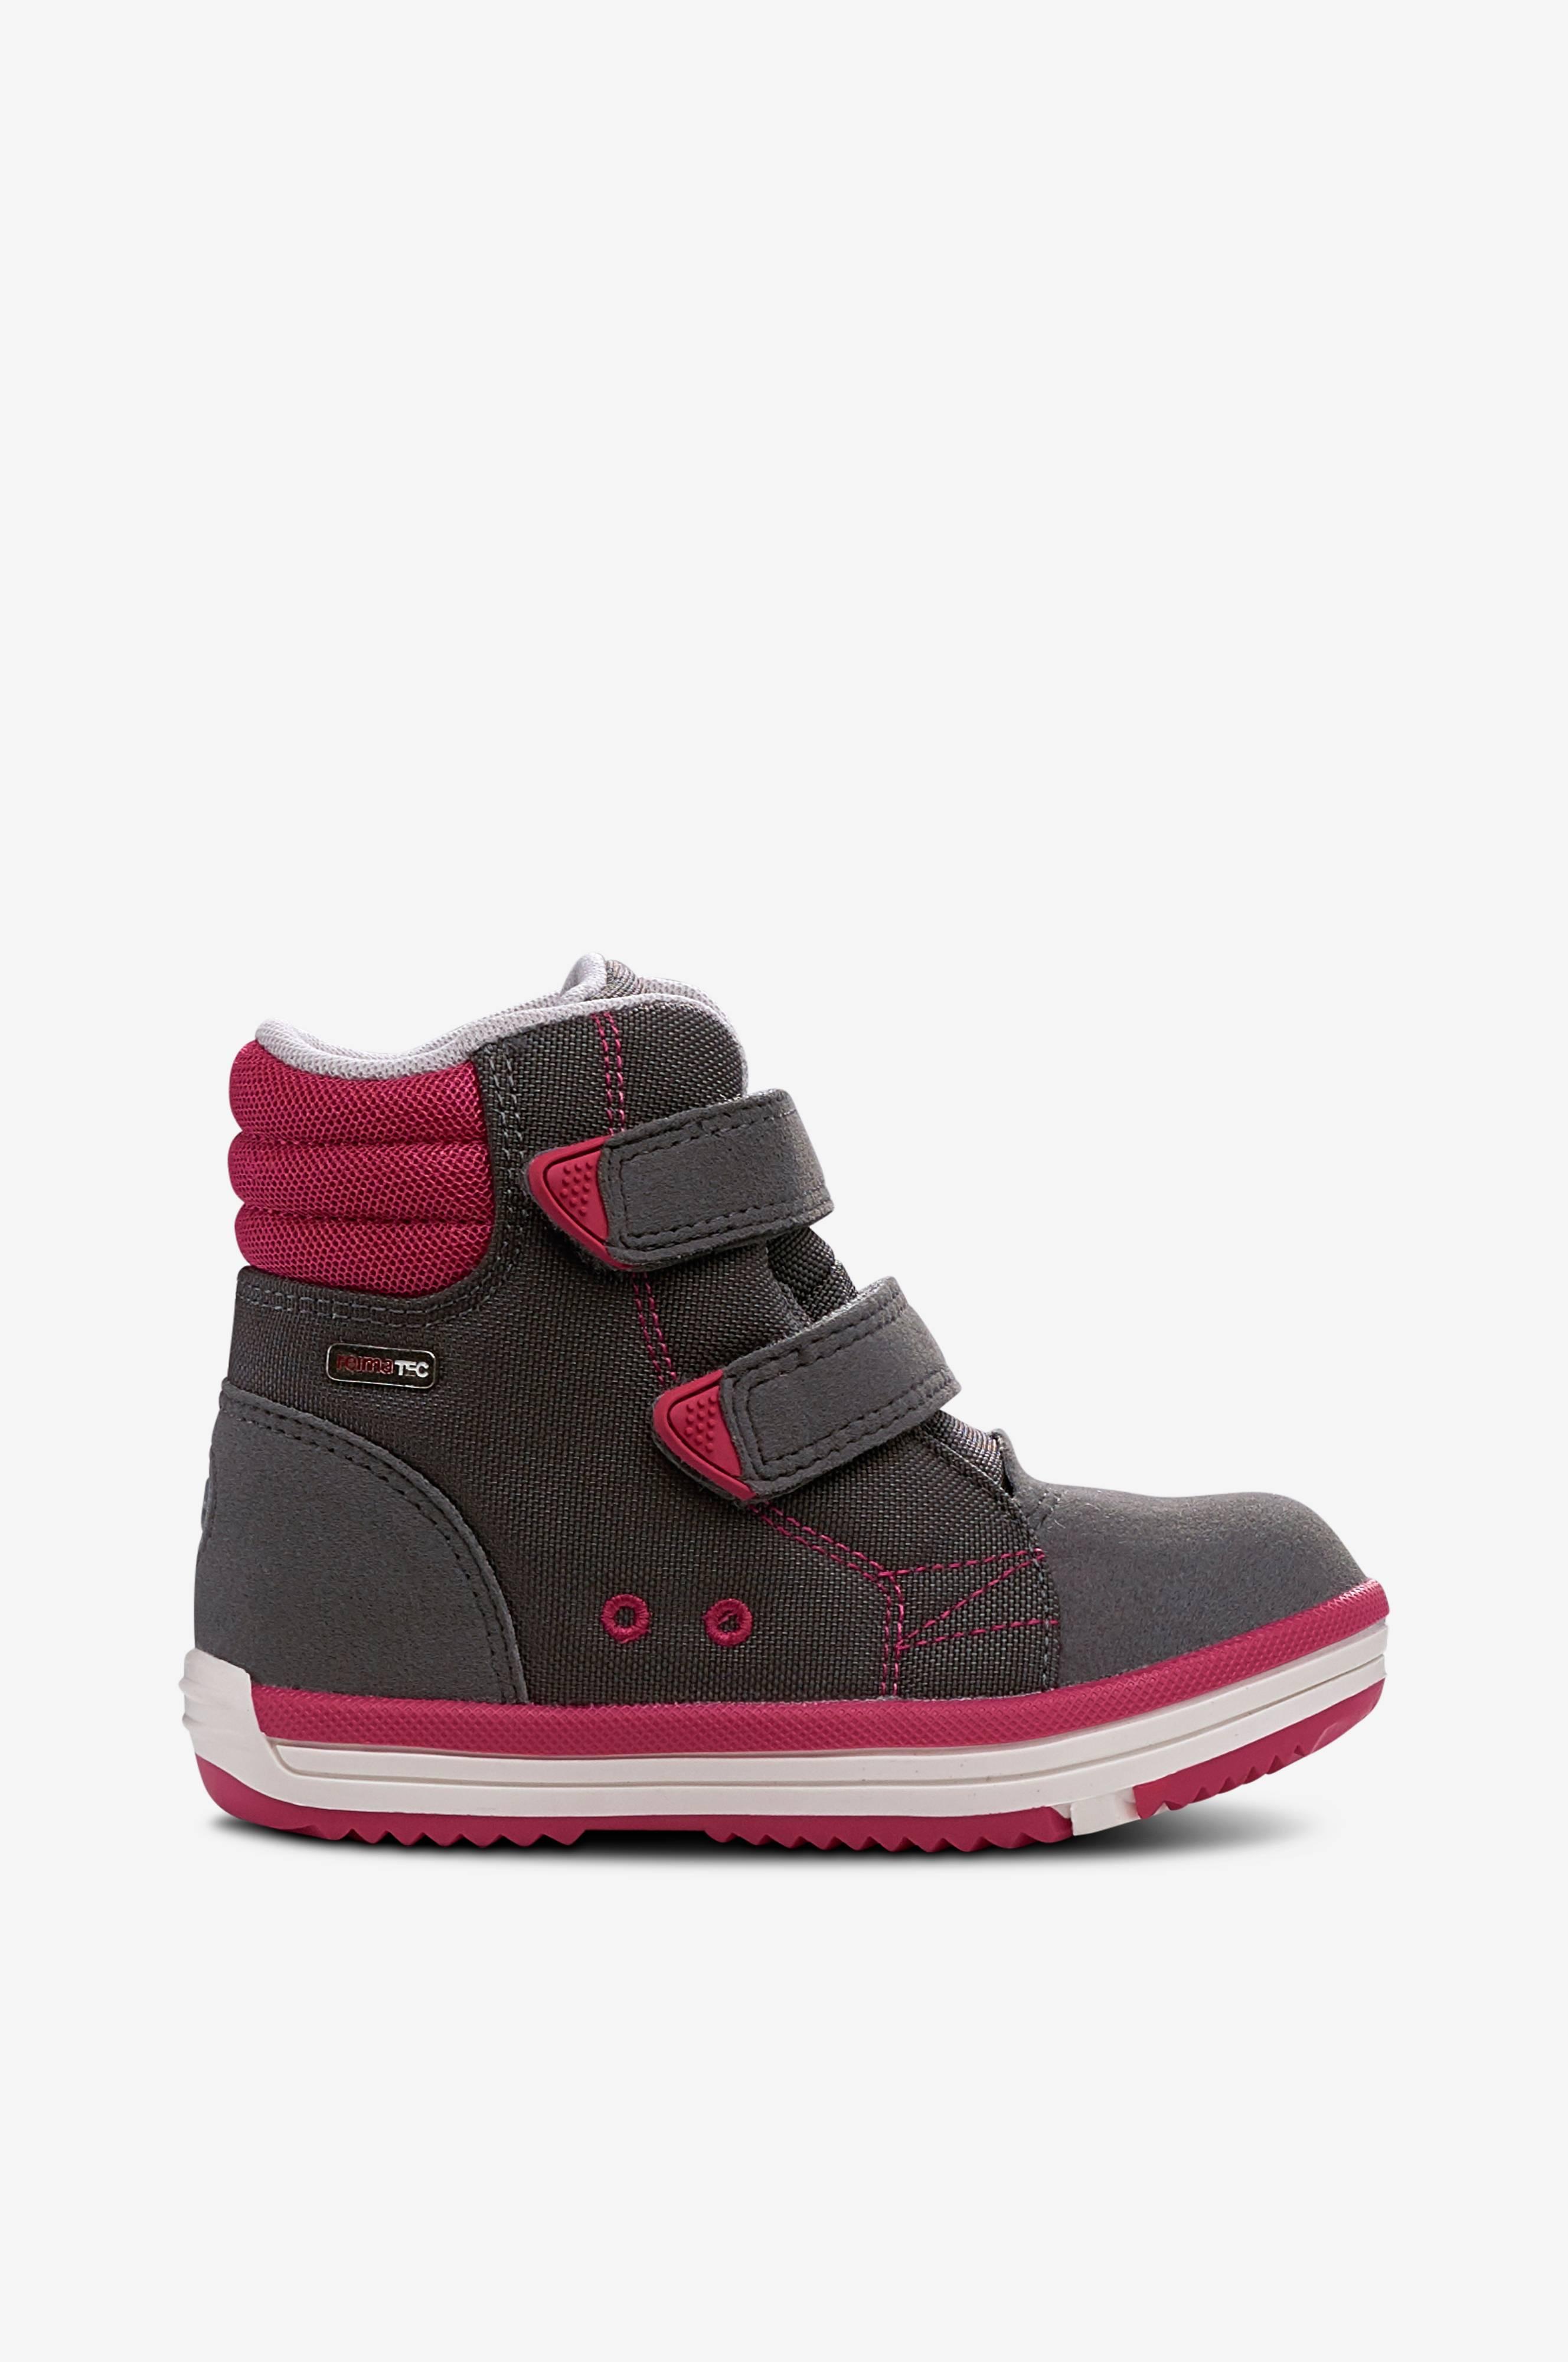 premium selection c9f7e 12f82 lasten kengät alennus